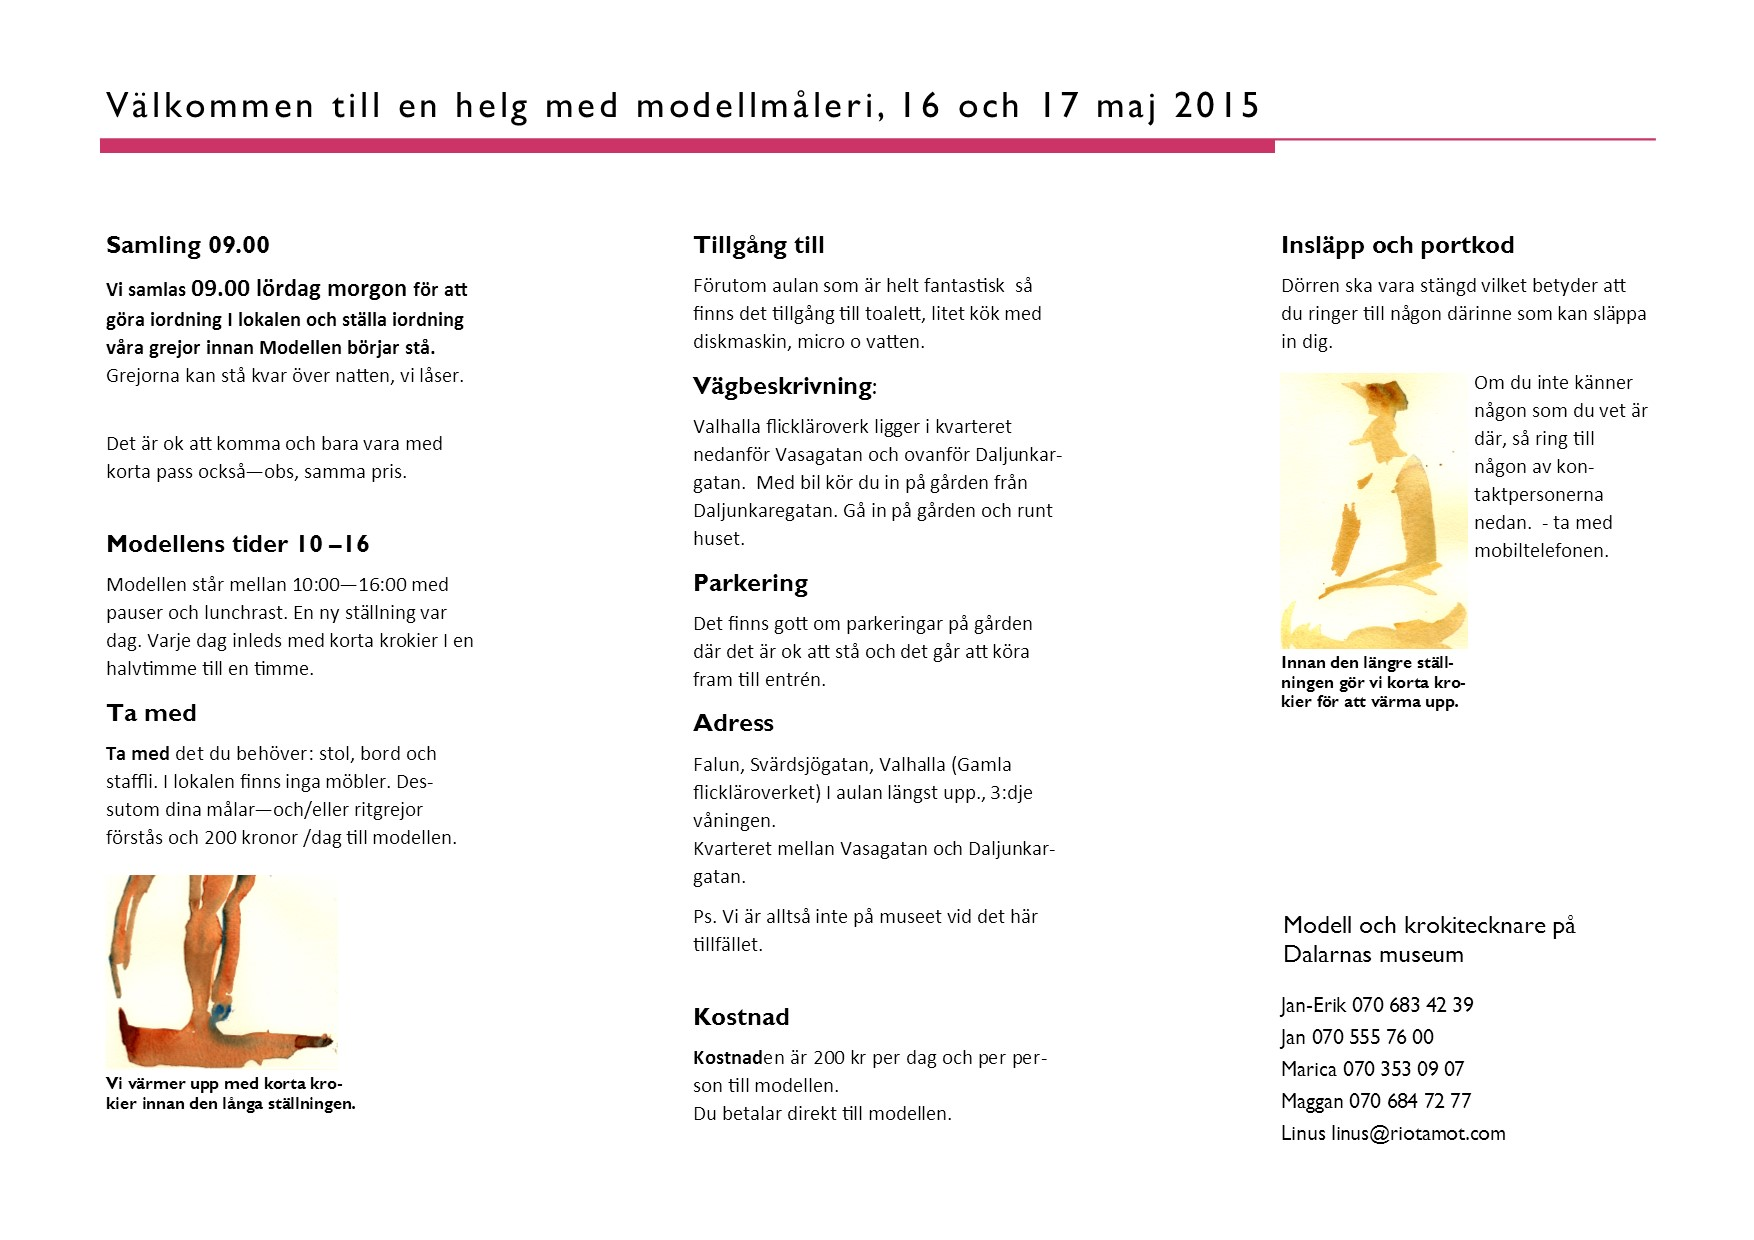 modellmåleri-helg 2015 16-17 maj broschyr